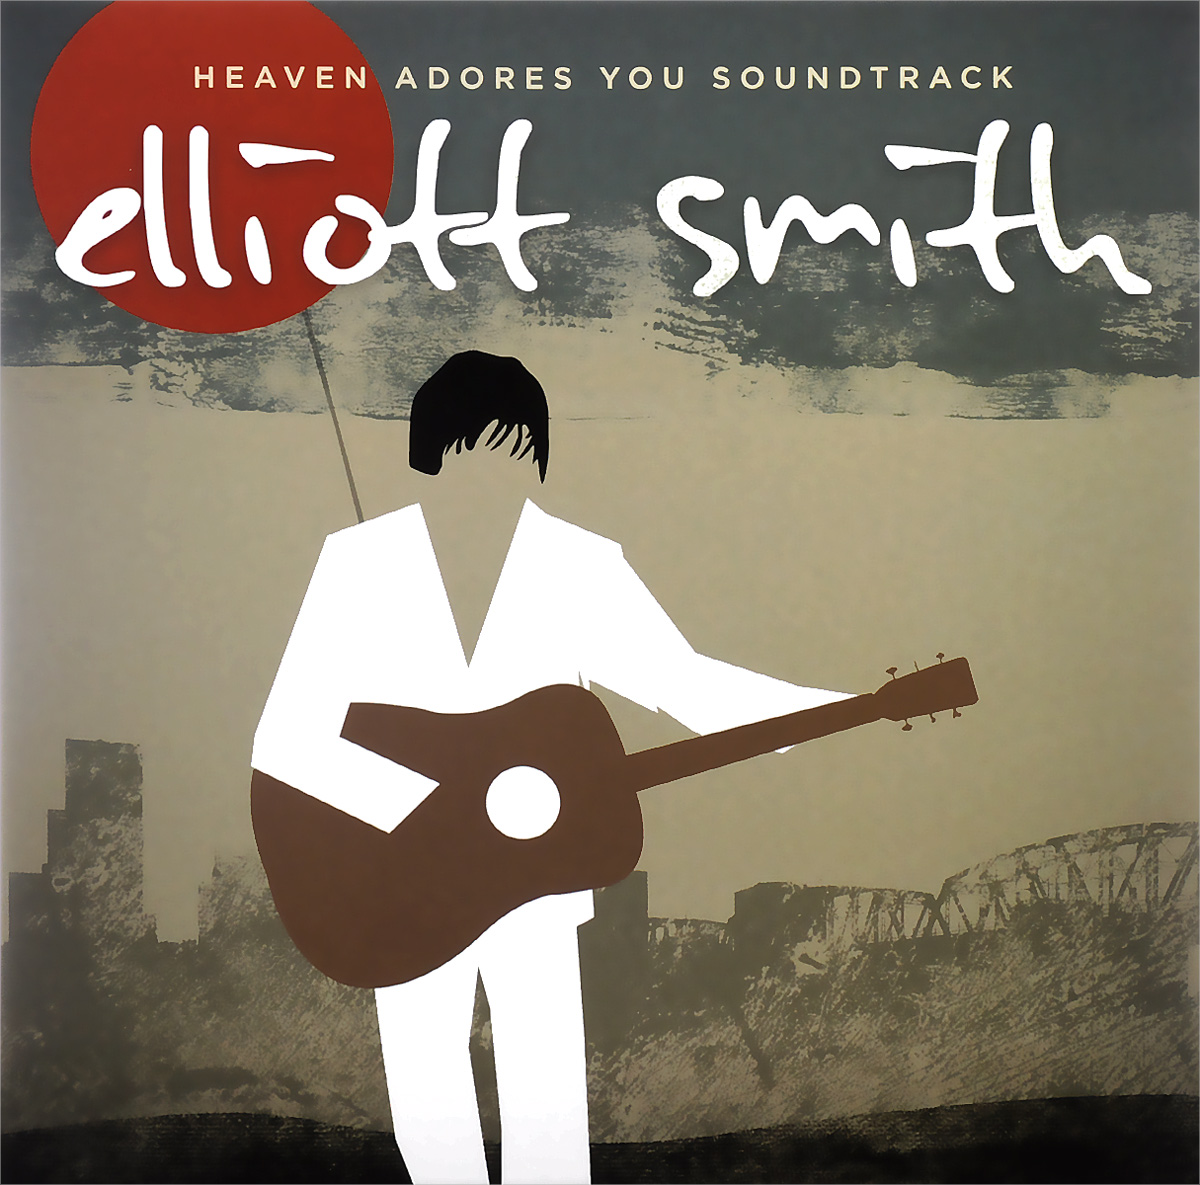 Эллиот Смит,Heatmiser,Neil Gust,Conan O'Brien Elliott Smith. Heaven Adores You. Soundtrack (2 LP) elliott smith elliott smith from a basement on the hill 2 lp